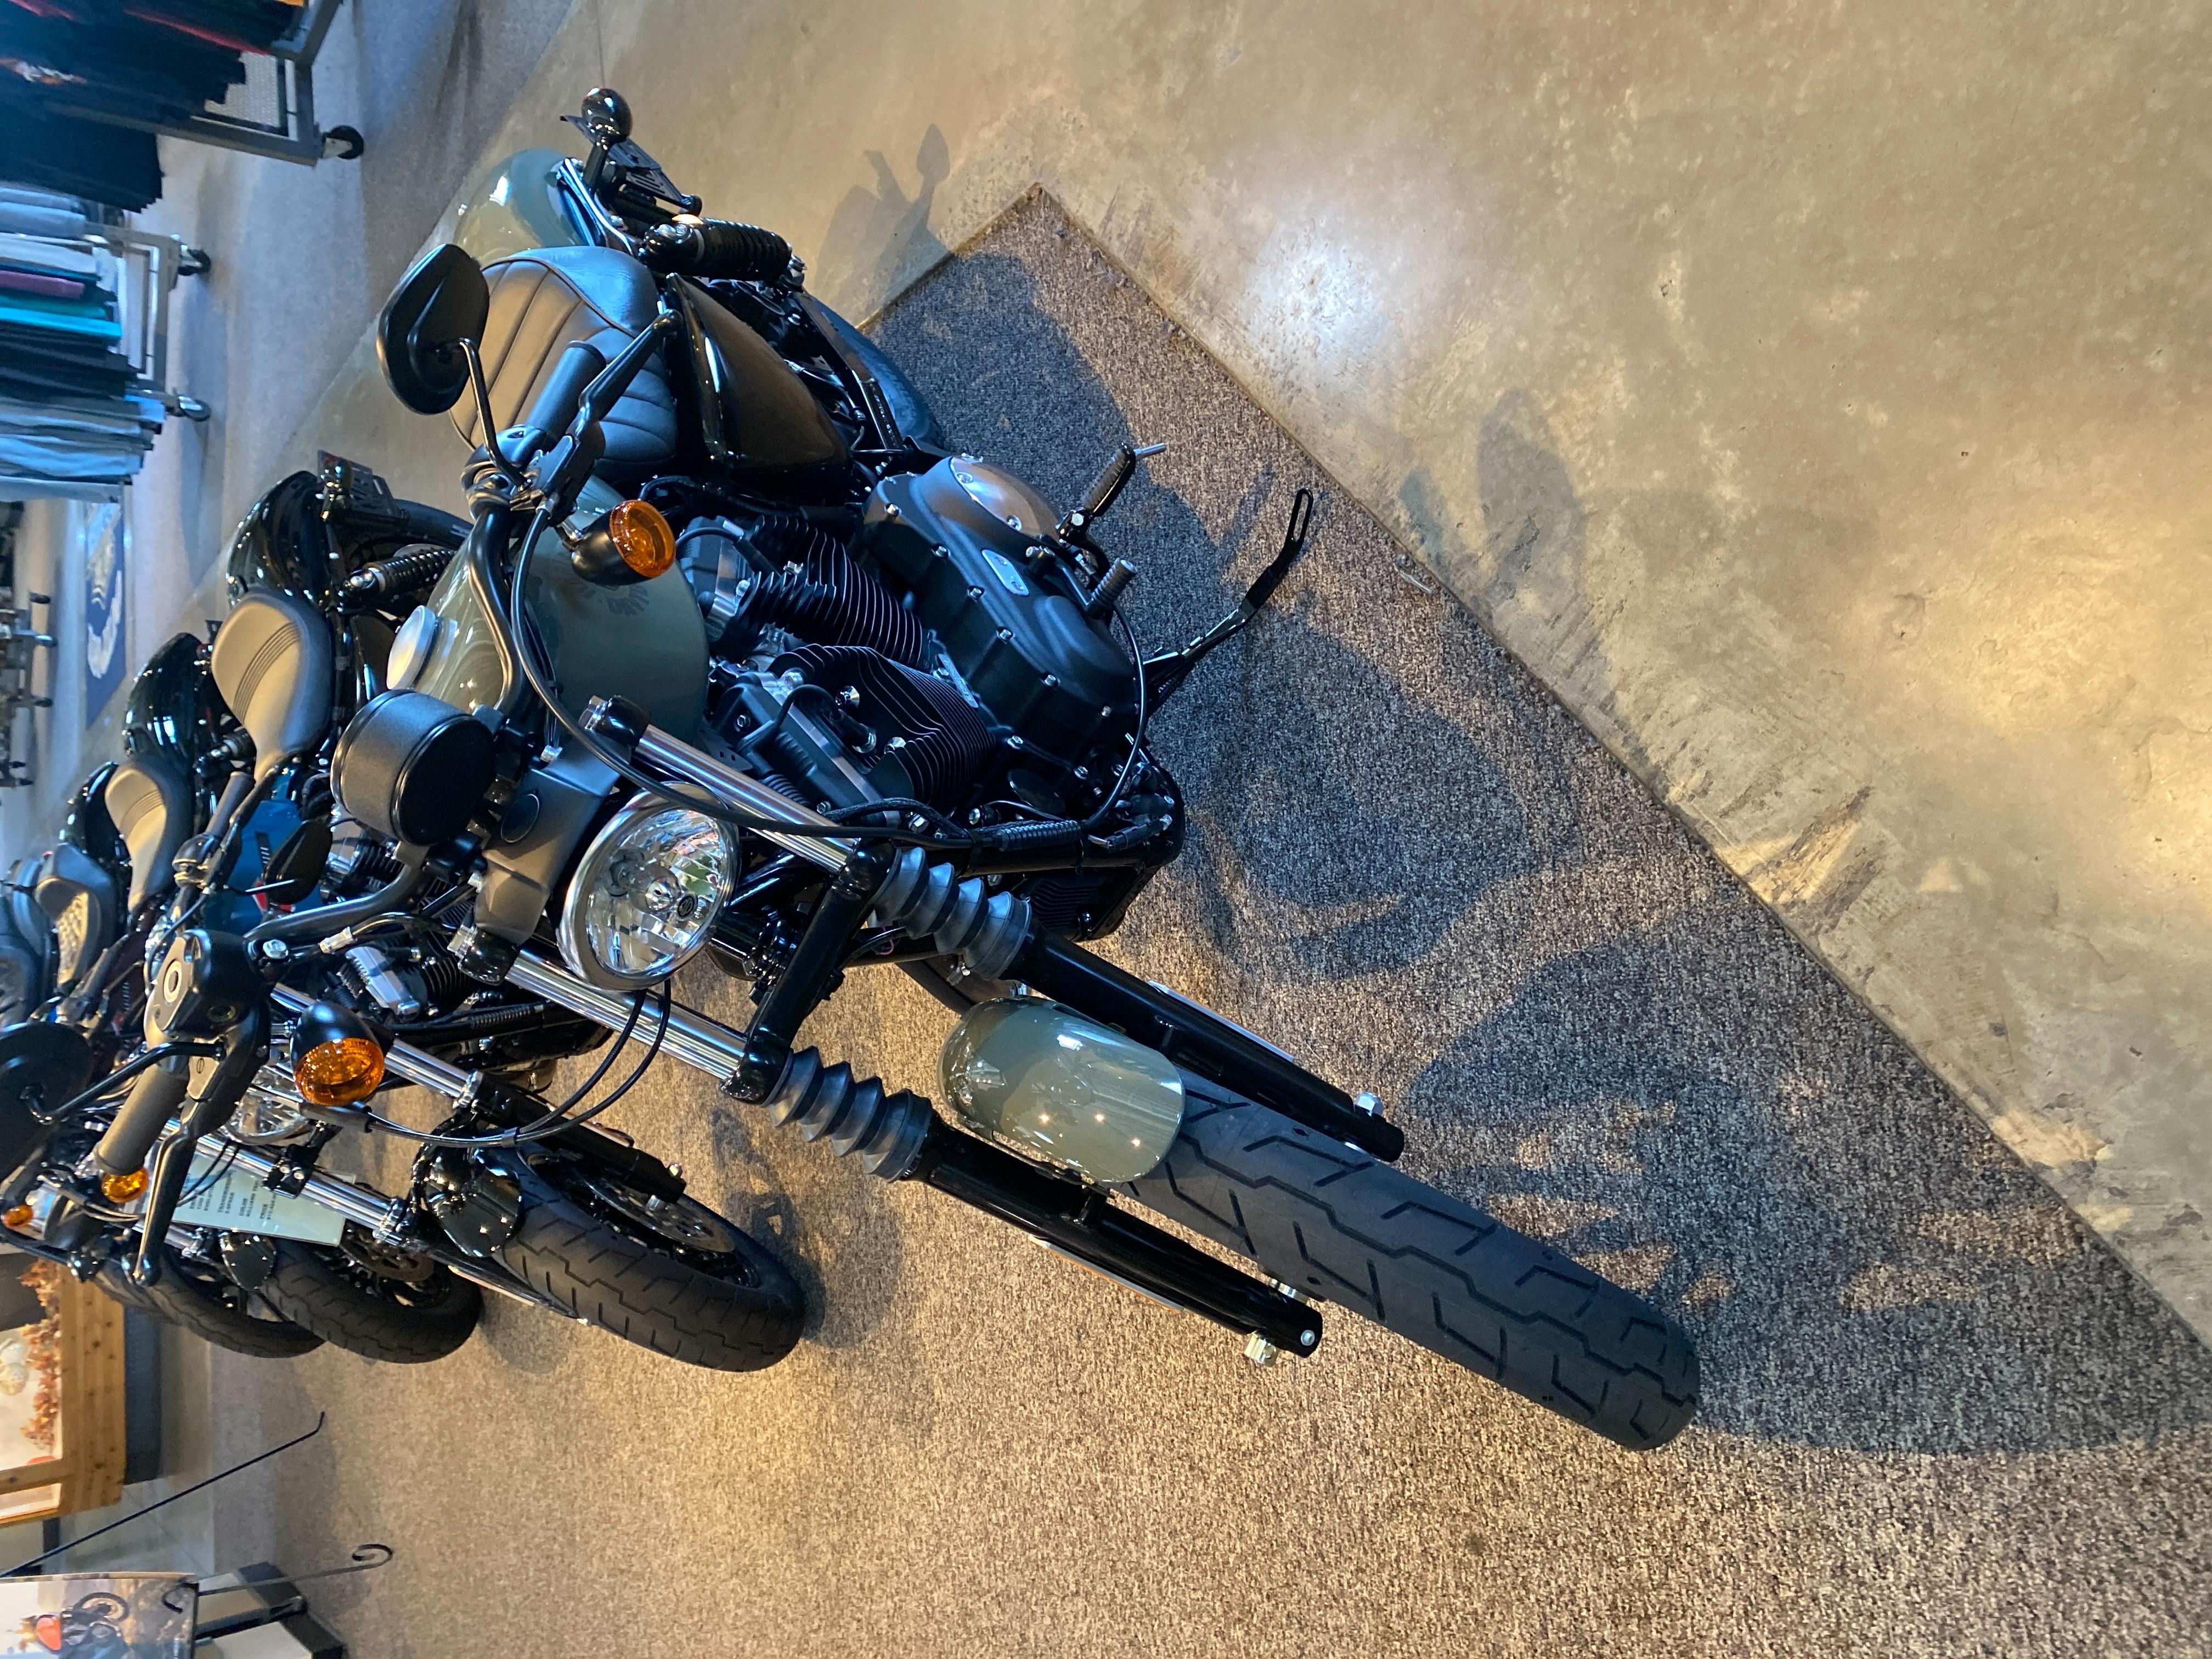 2021 Harley-Davidson Cruiser XL 883N Iron 883 at Outpost Harley-Davidson